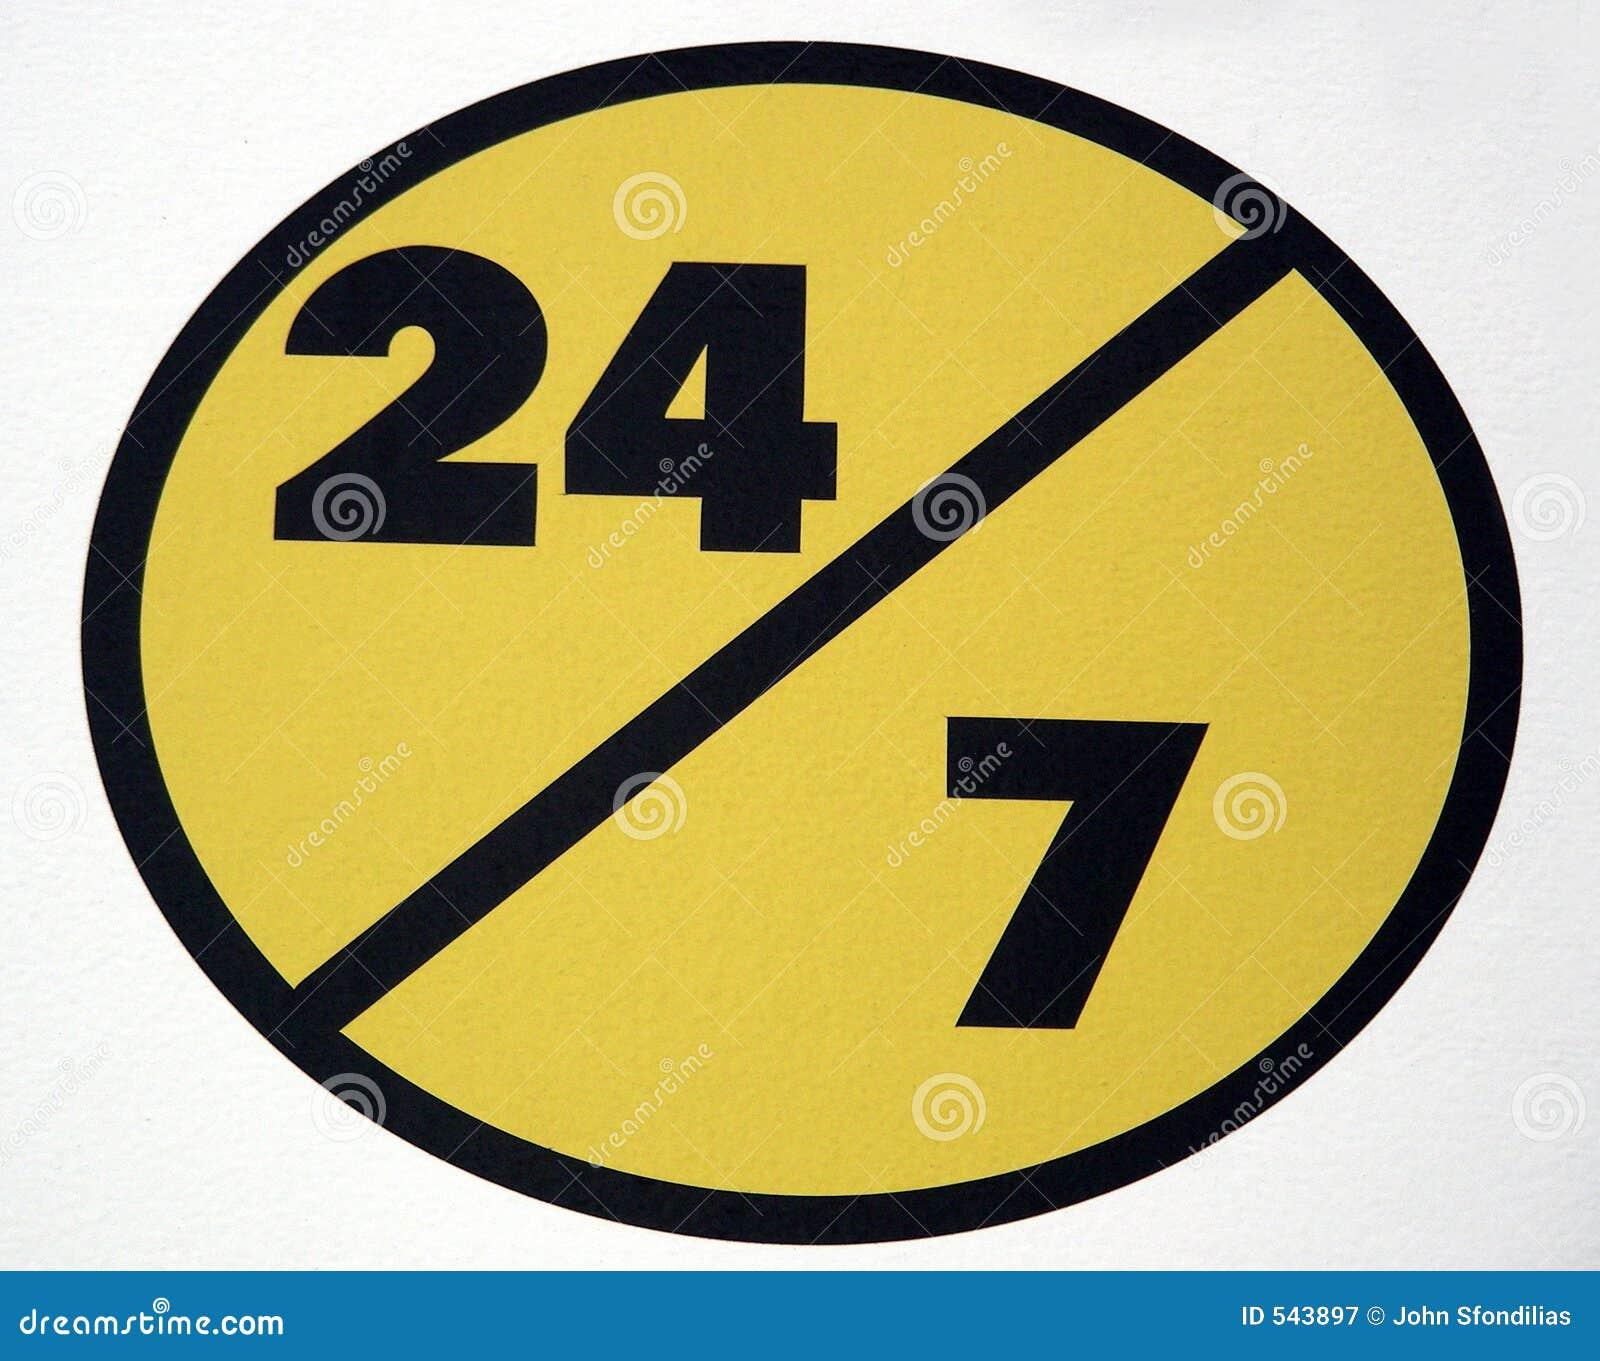 Download 四七二十 库存图片. 图片 包括有 平均, 投反对票, 业务量, 二十, 街道, 黄色, 几小时, 几天, 符号 - 543897